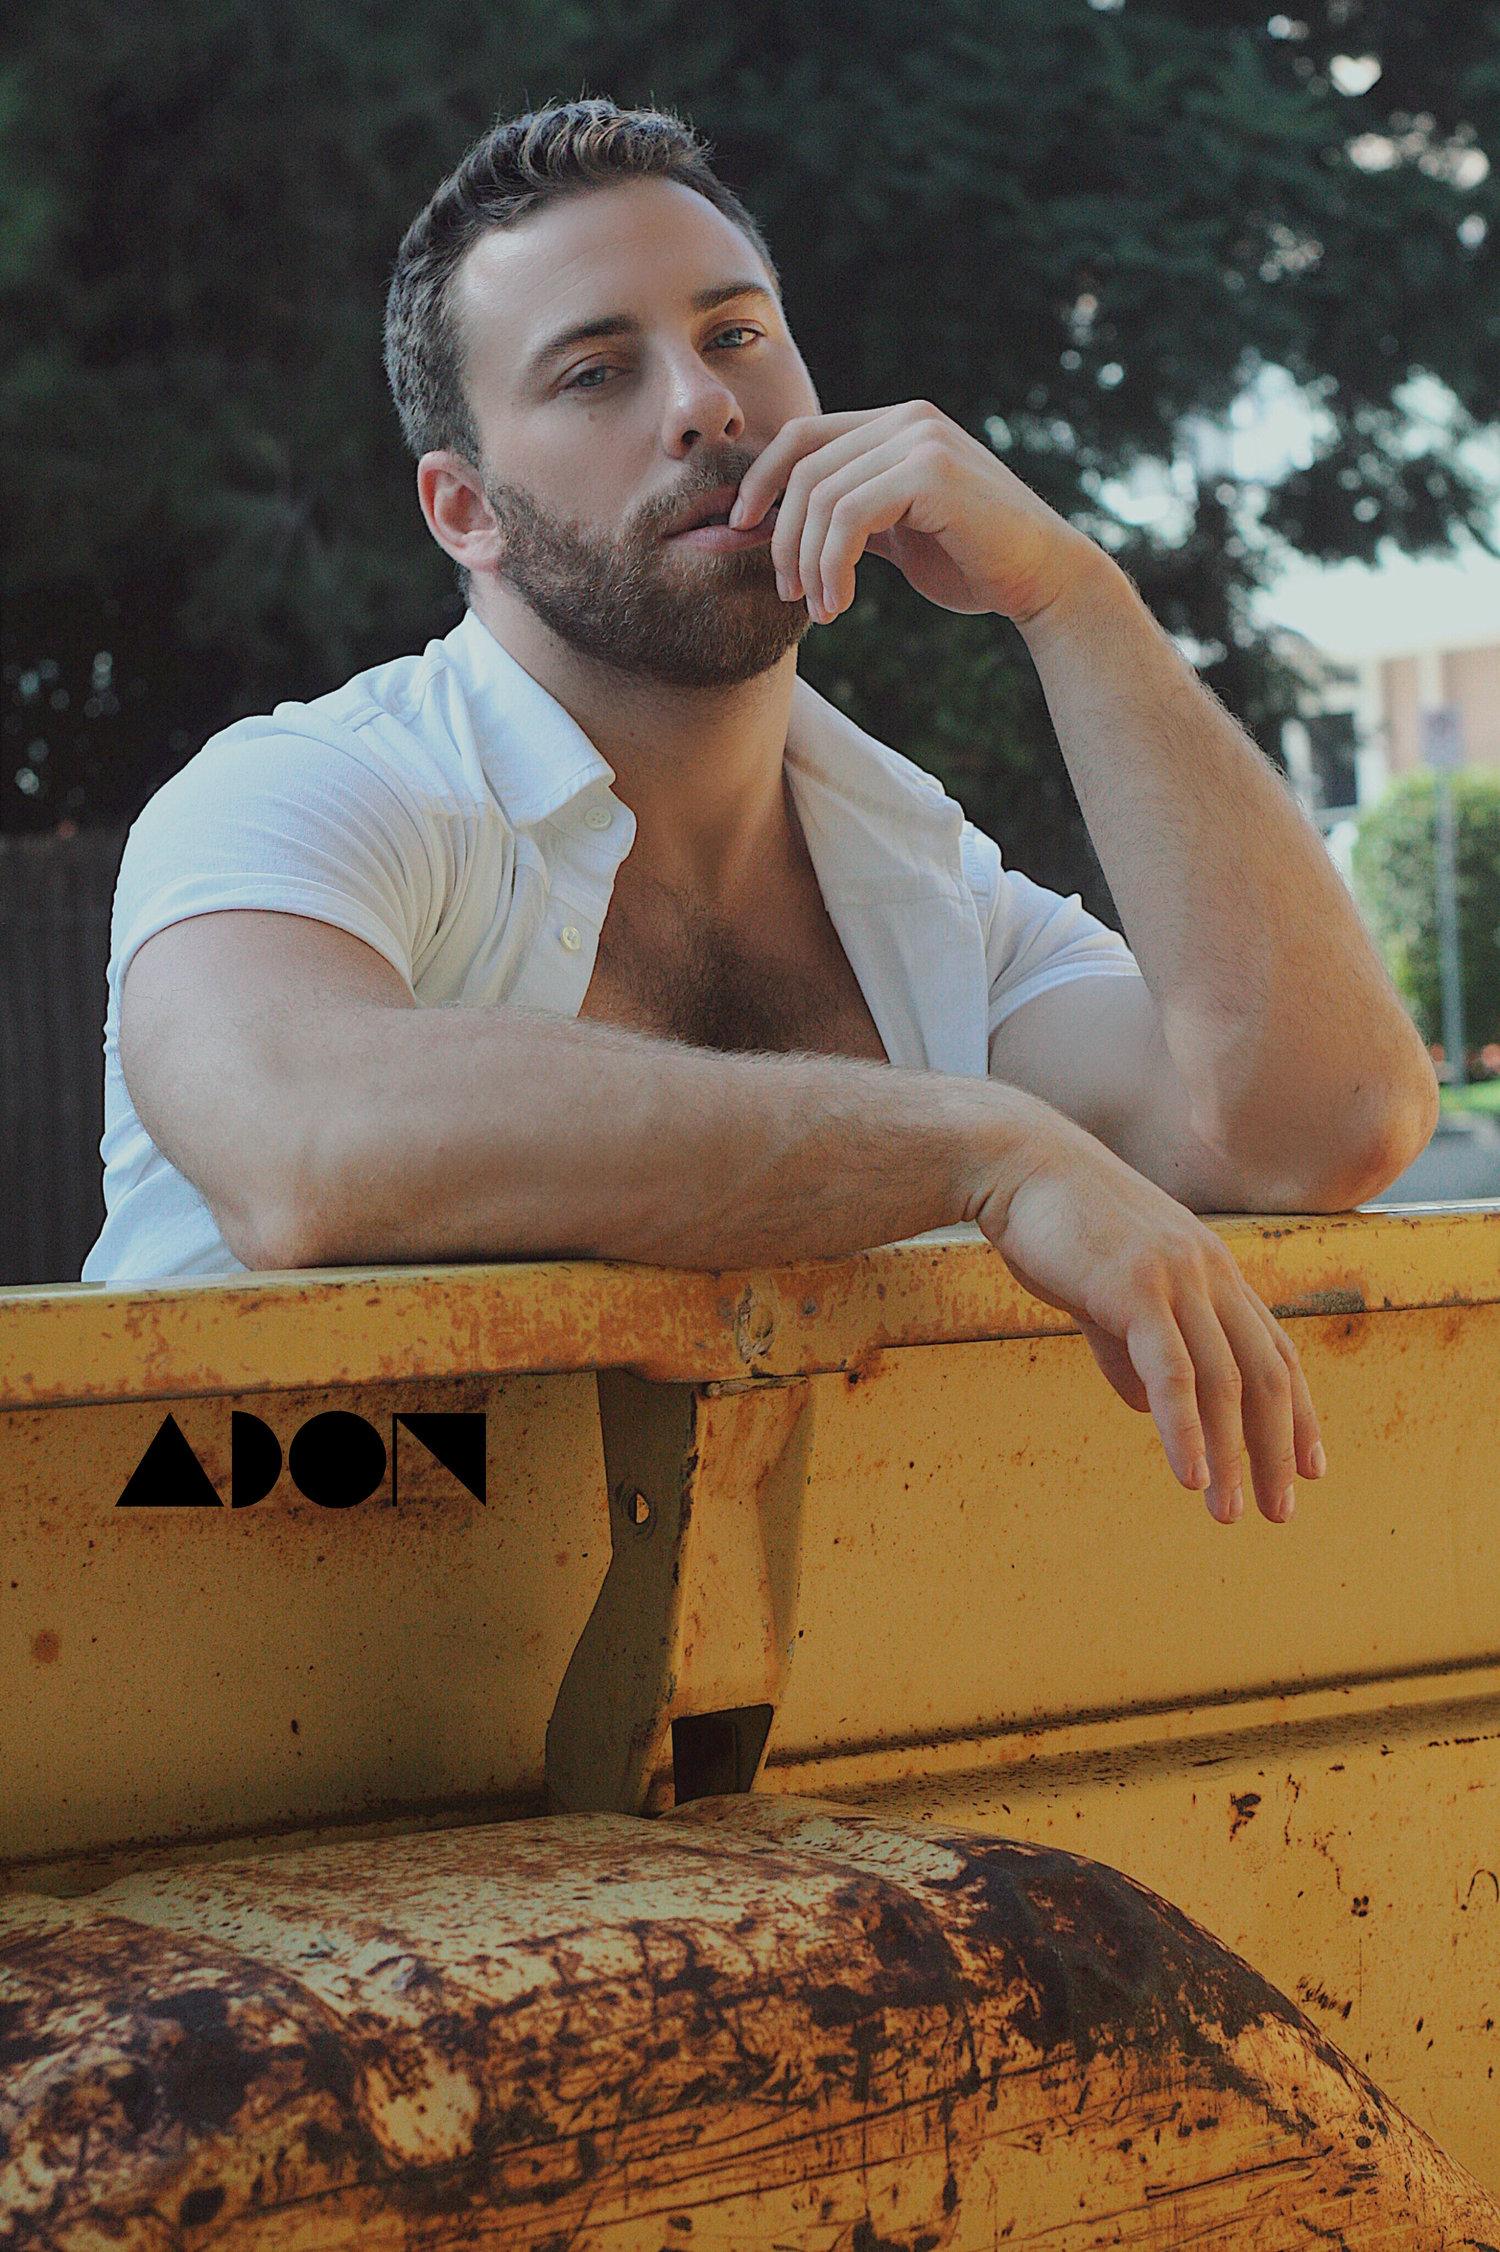 Adon Exclusive: Model Bruin Collinsworth By Luis Lucas